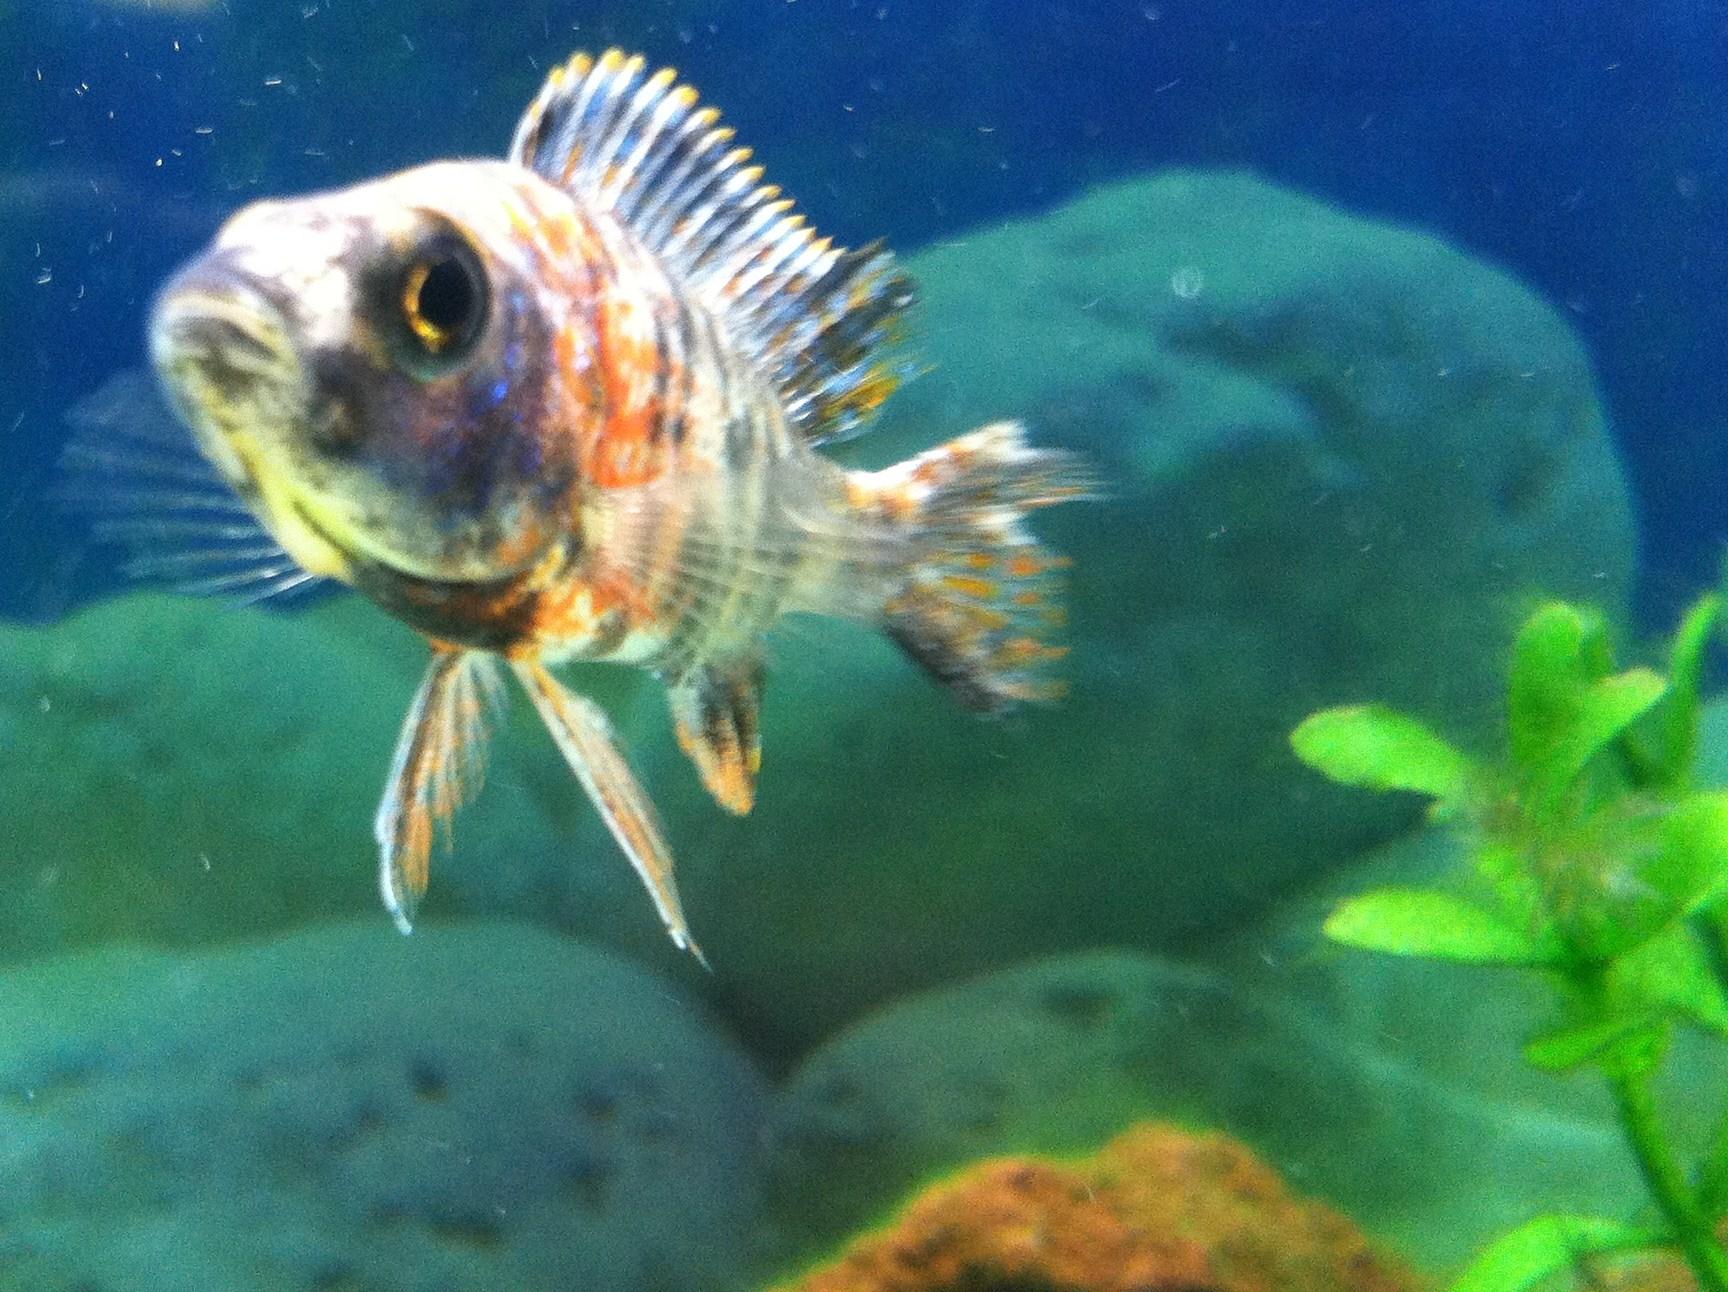 Freshwater fish kansas city - Freshwater Fish Kansas City